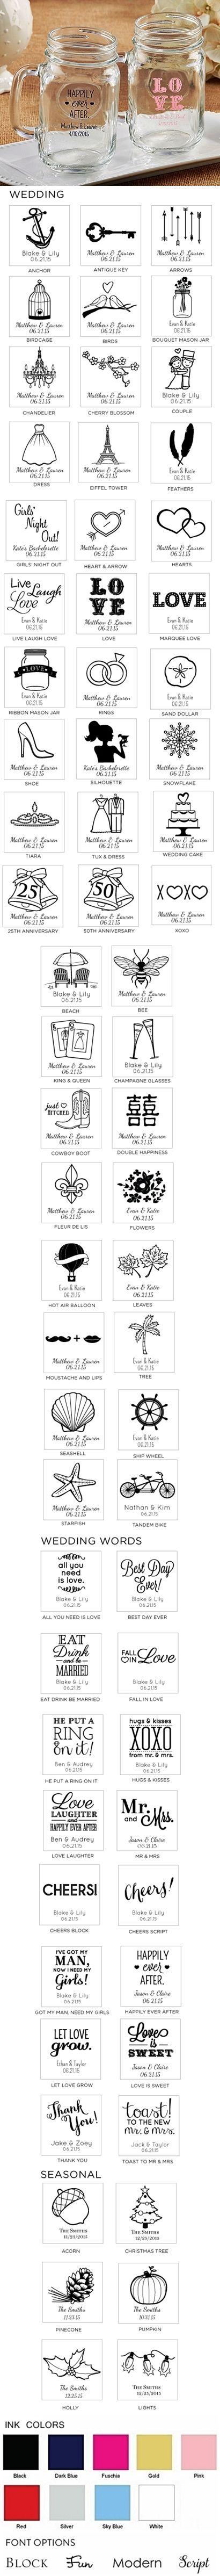 78 best Favor Jars and Candy Jars images on Pinterest | Wedding ...